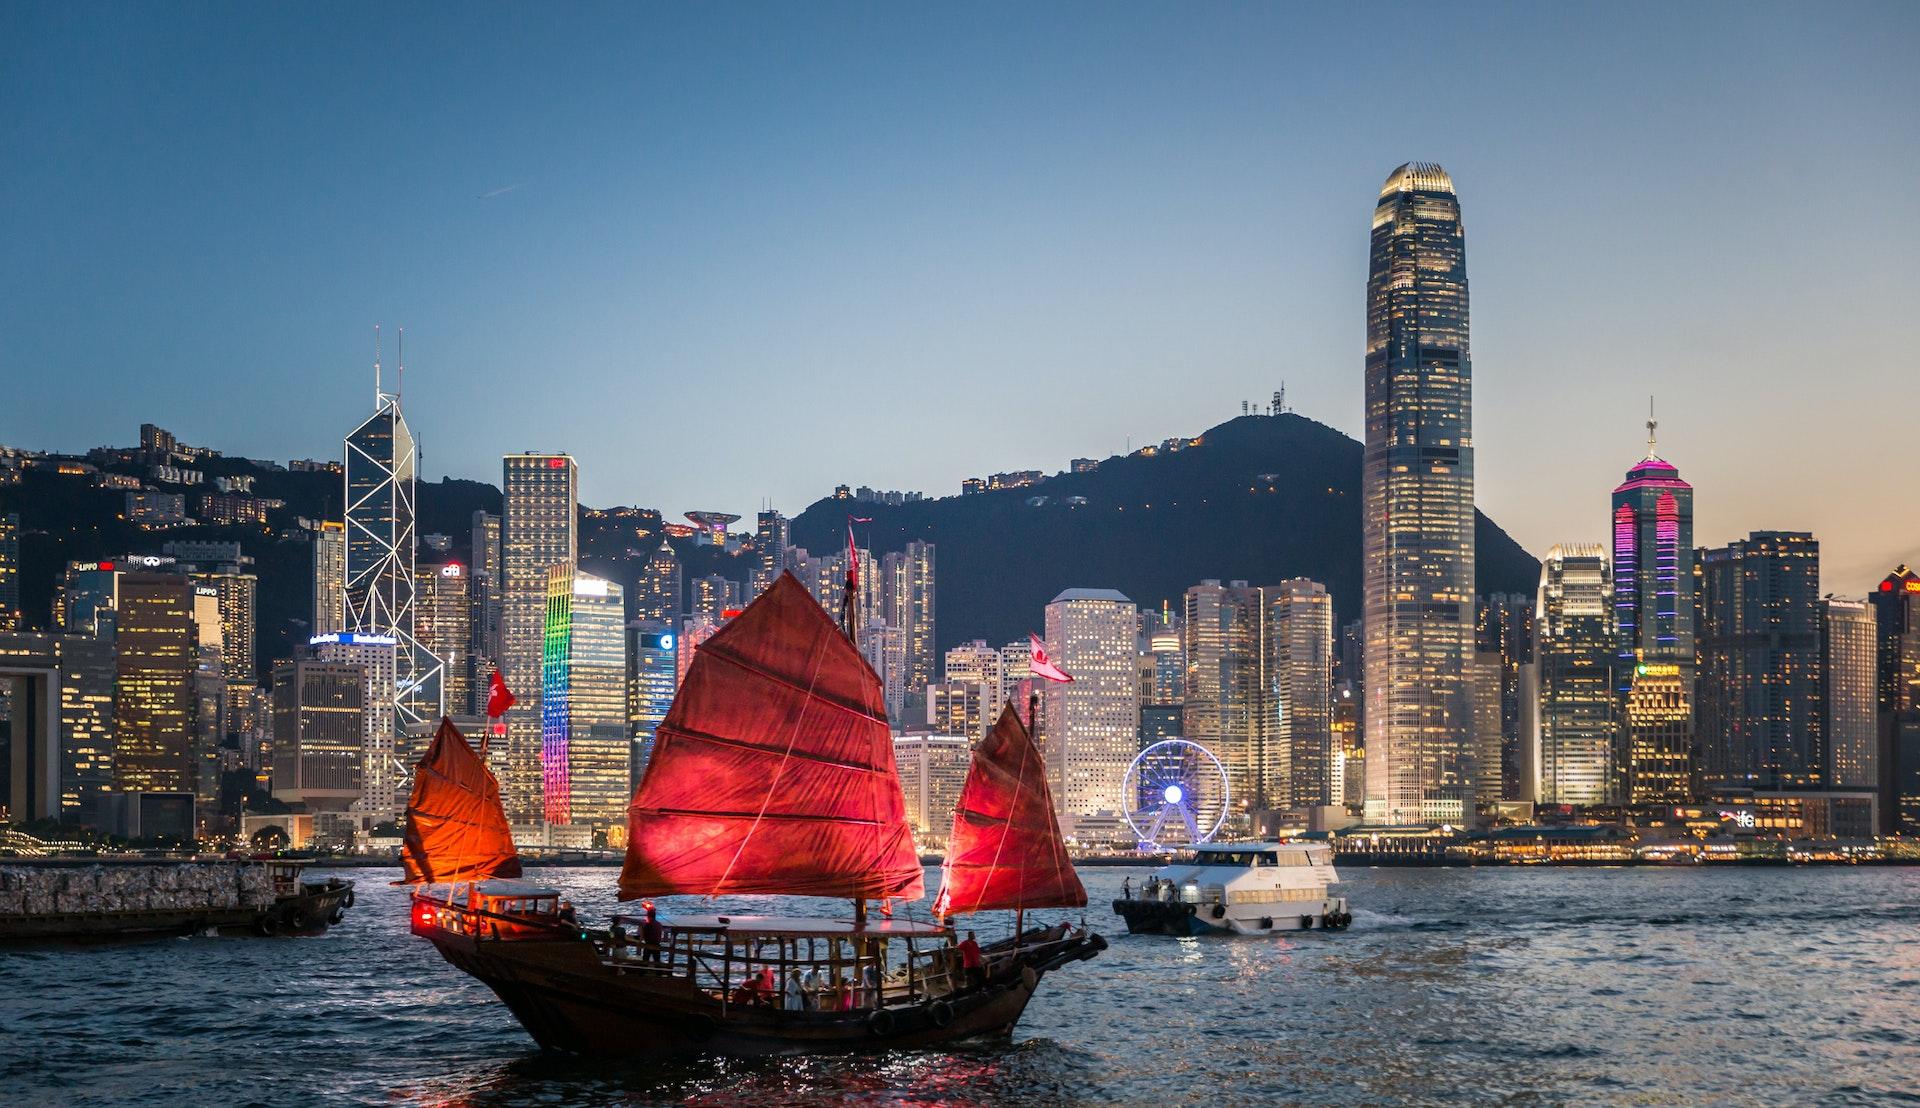 Hong Kong © Yongyuan Dai, Getty Images